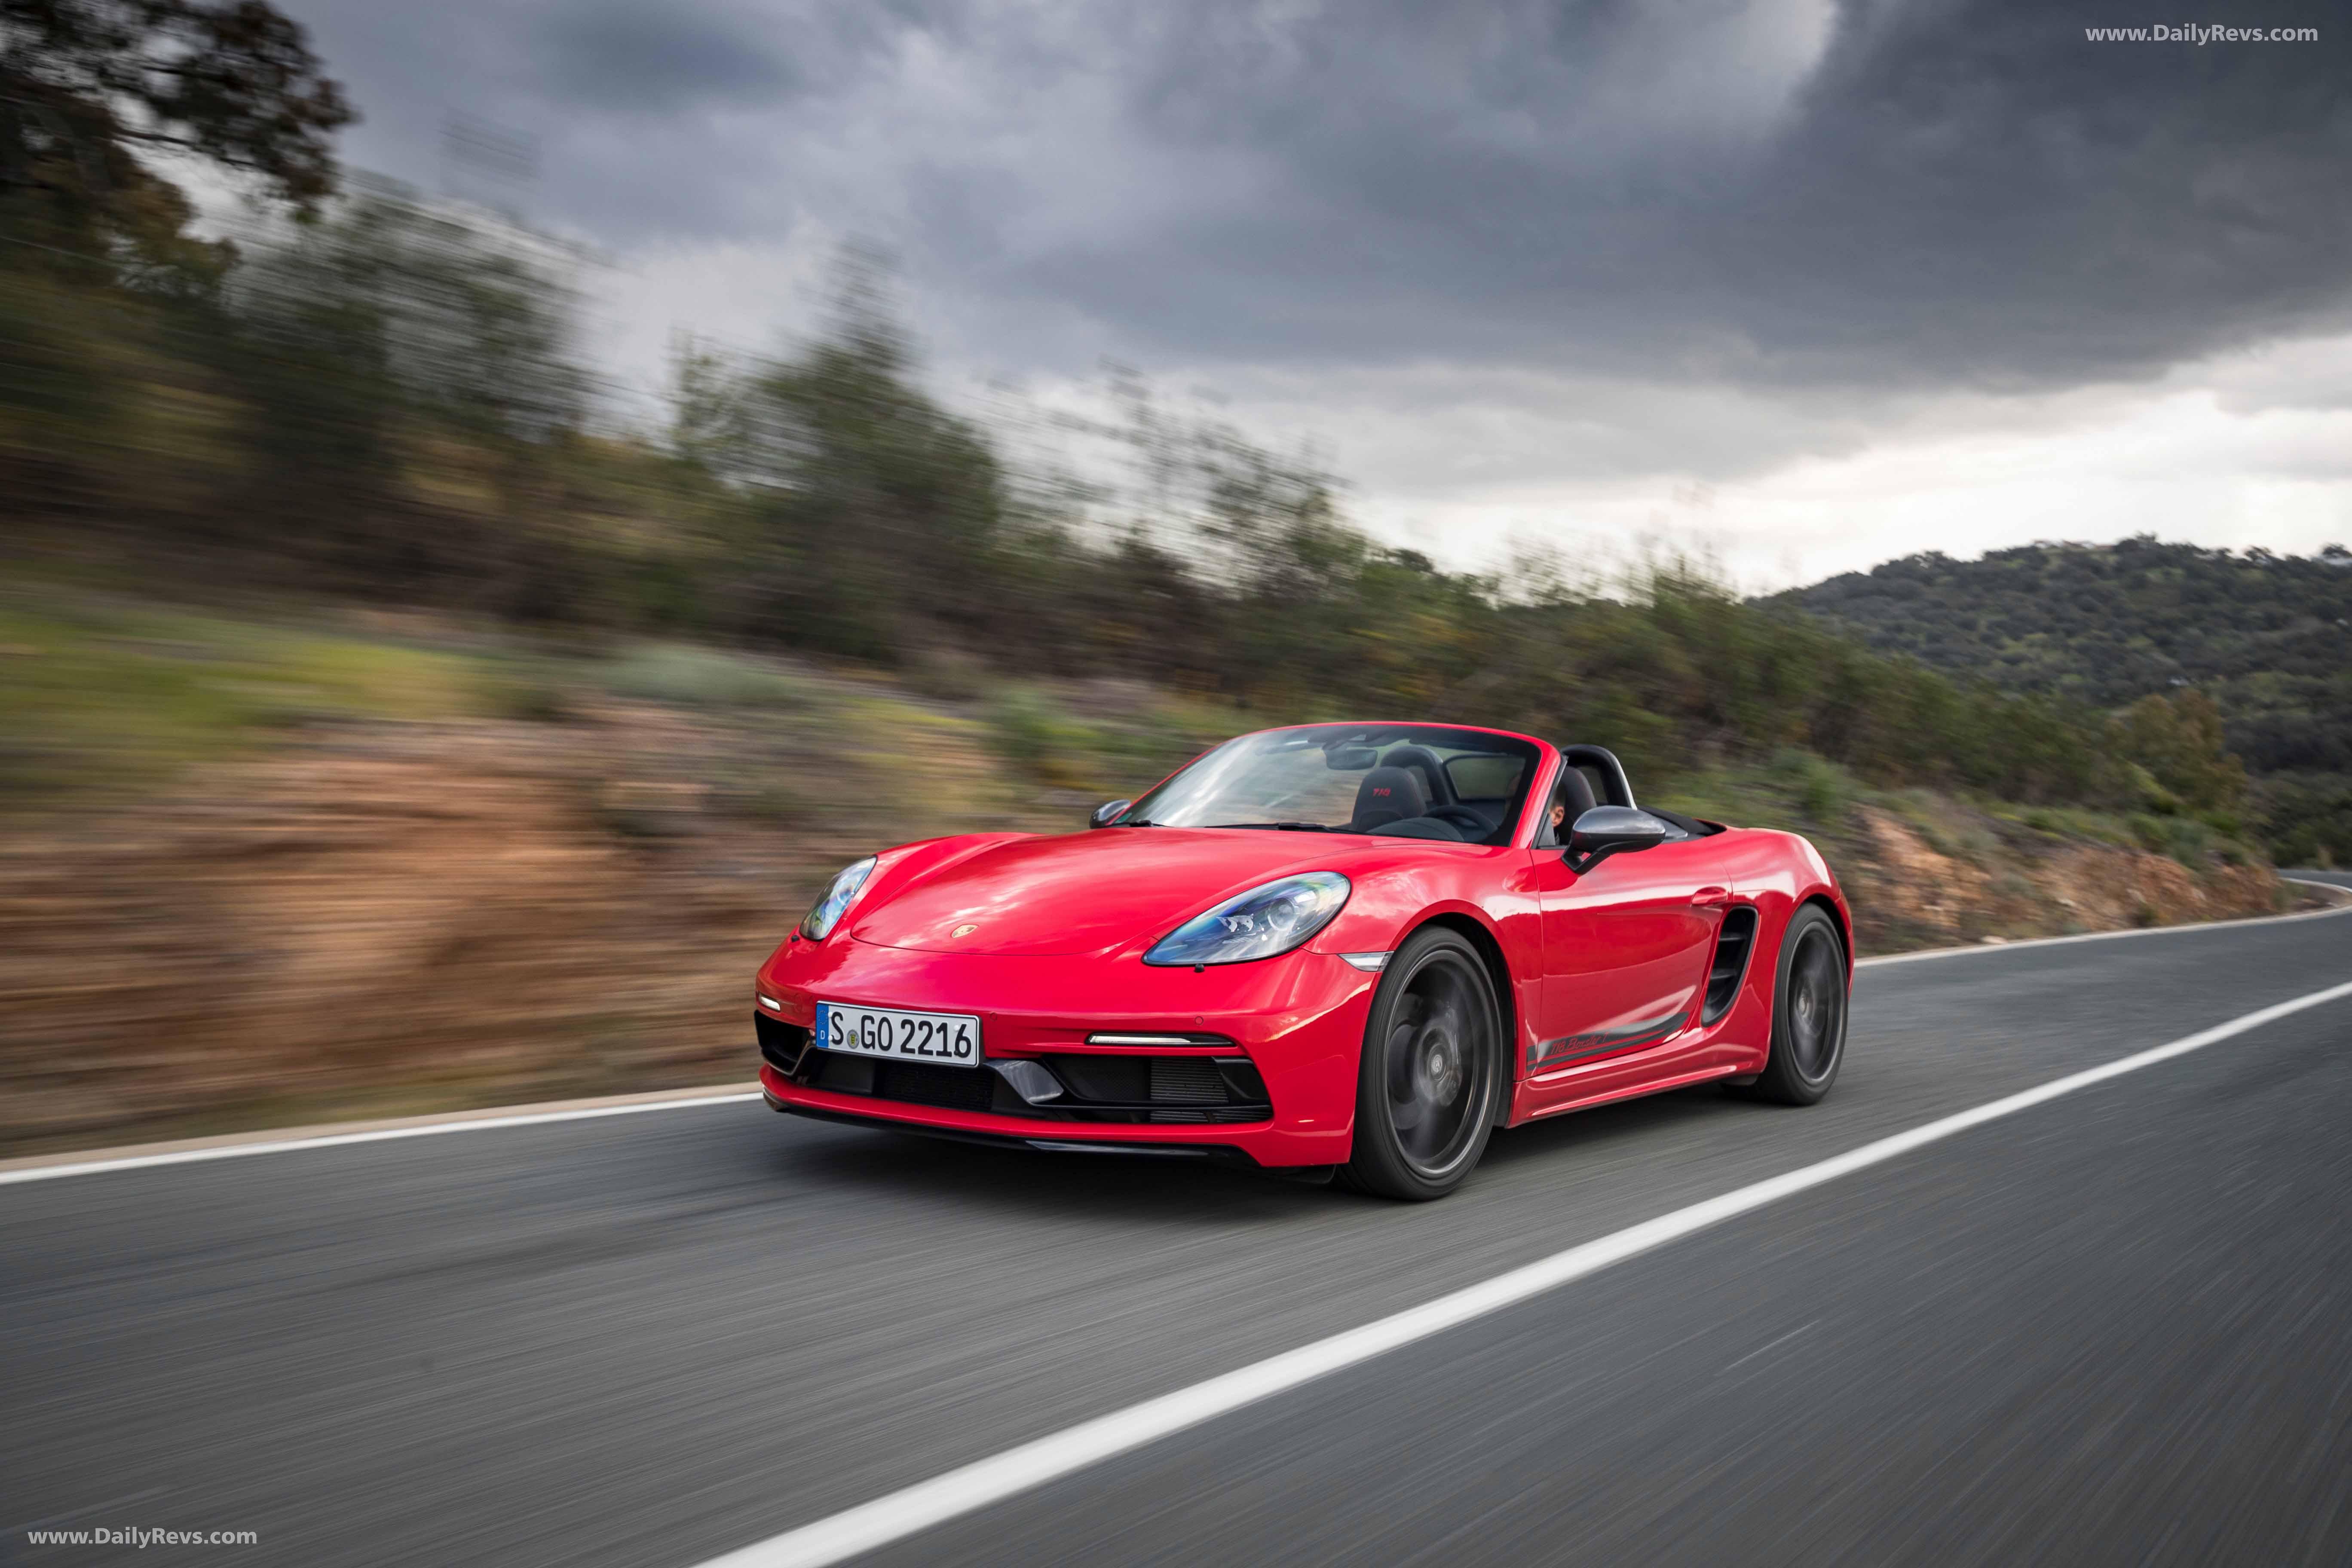 2019 Porsche 718 Boxster T - HD Pictures,Specs,information ...